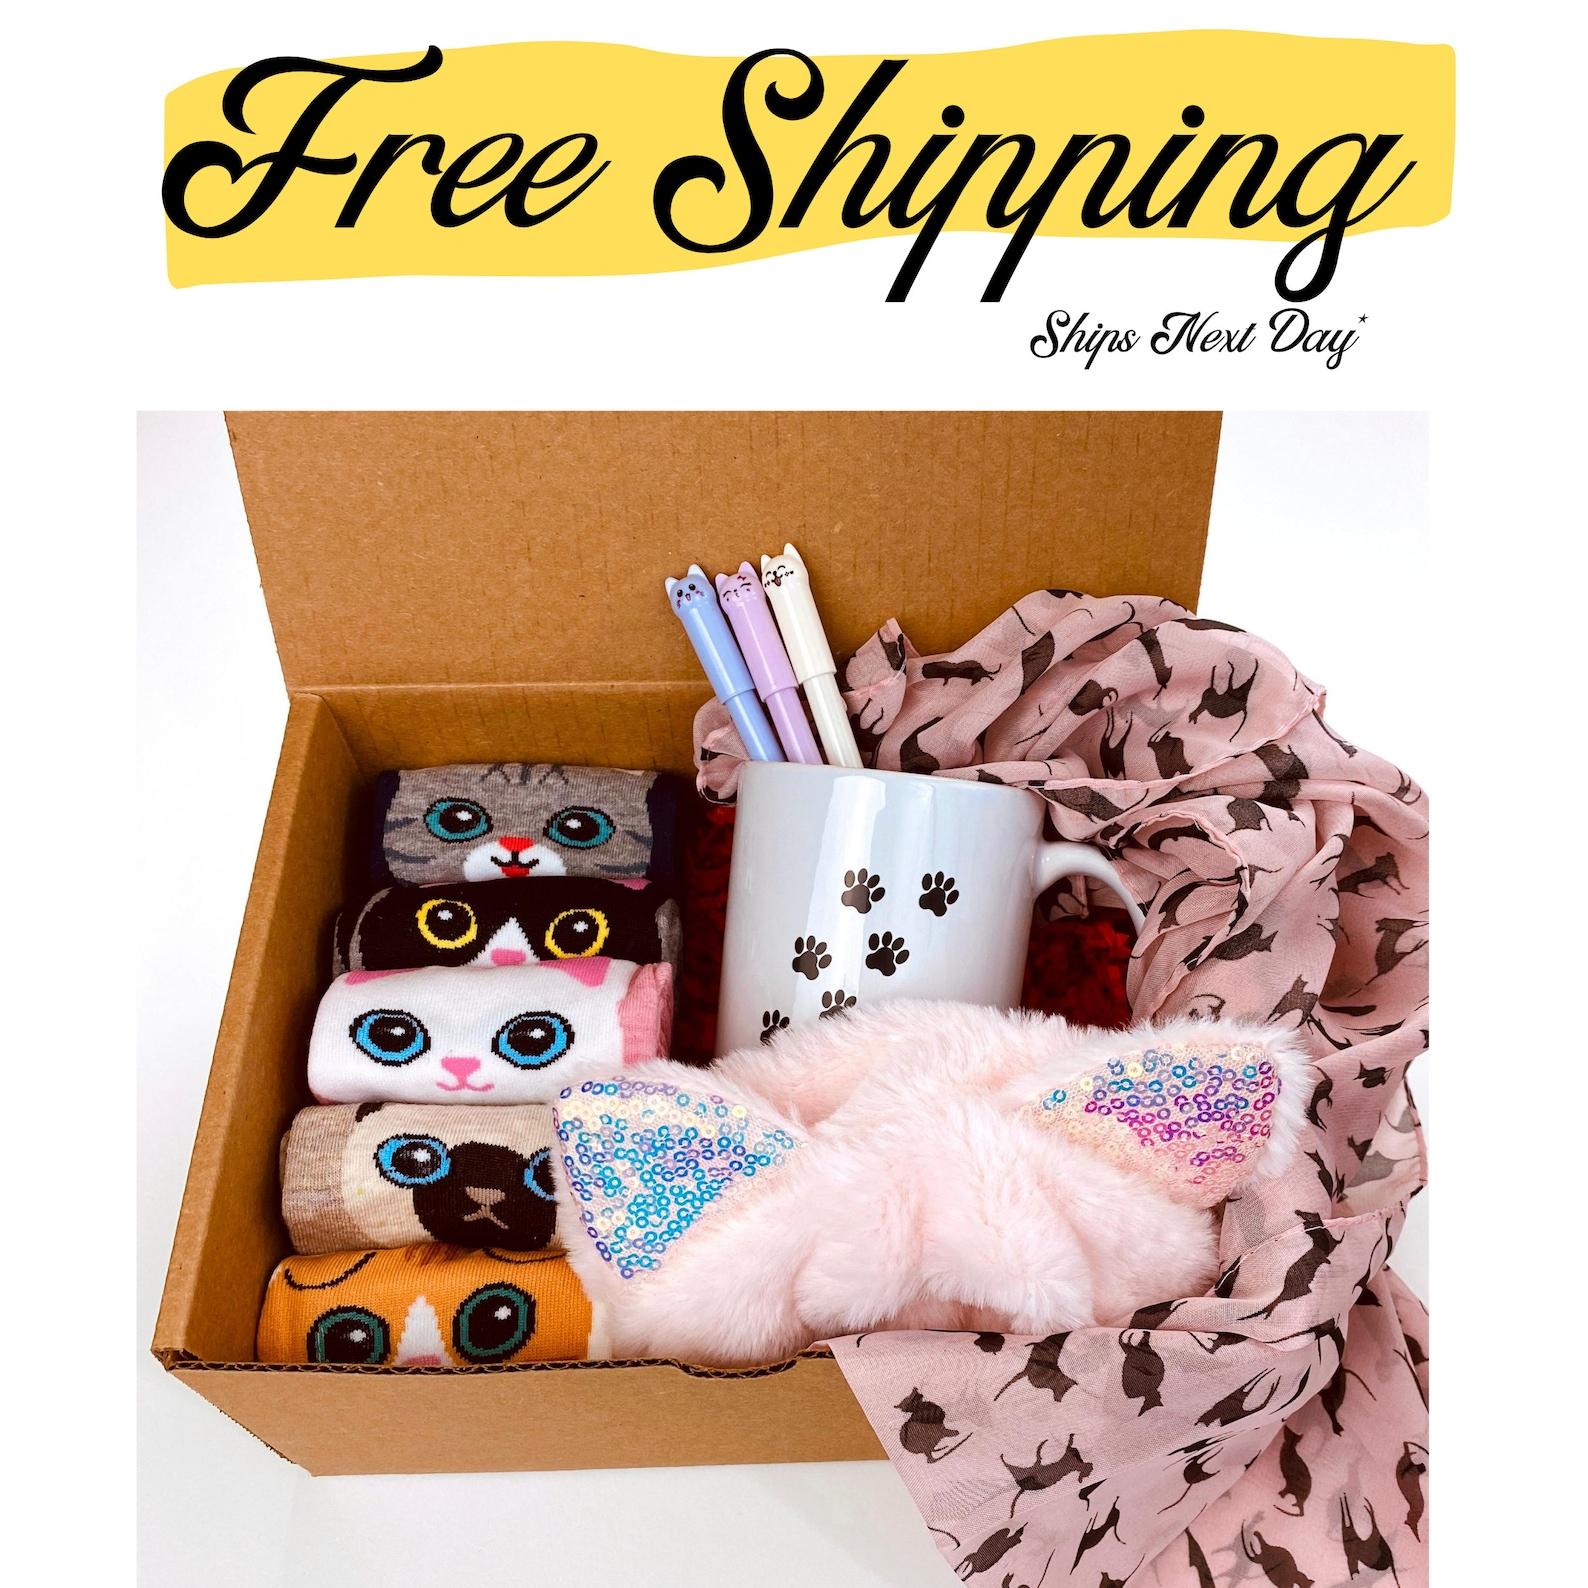 Catravaganza Cat Lover's Gift Box